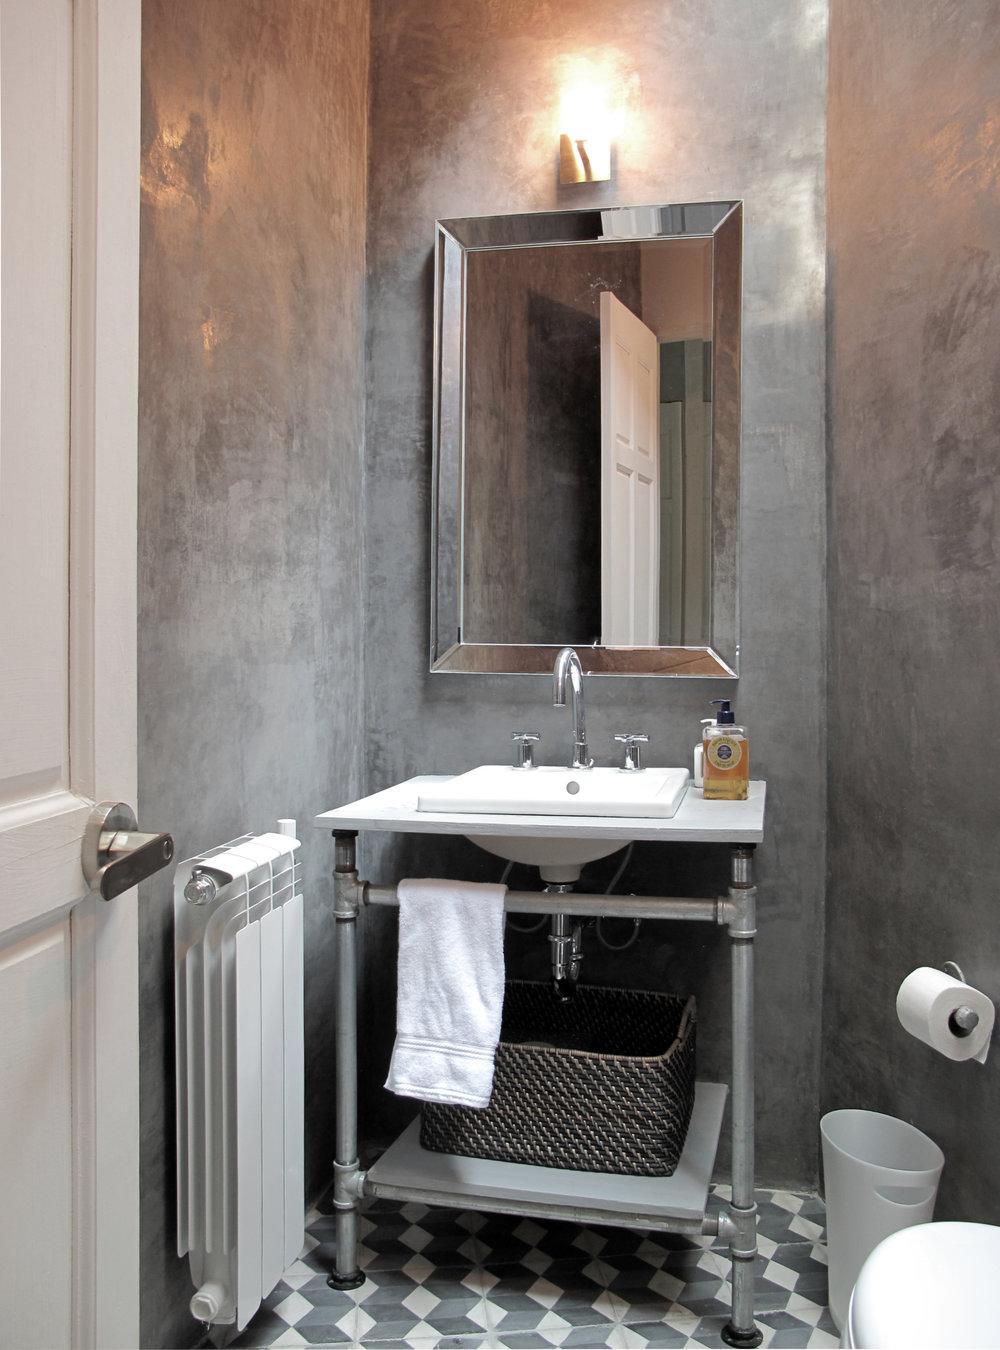 baño visitas.jpg